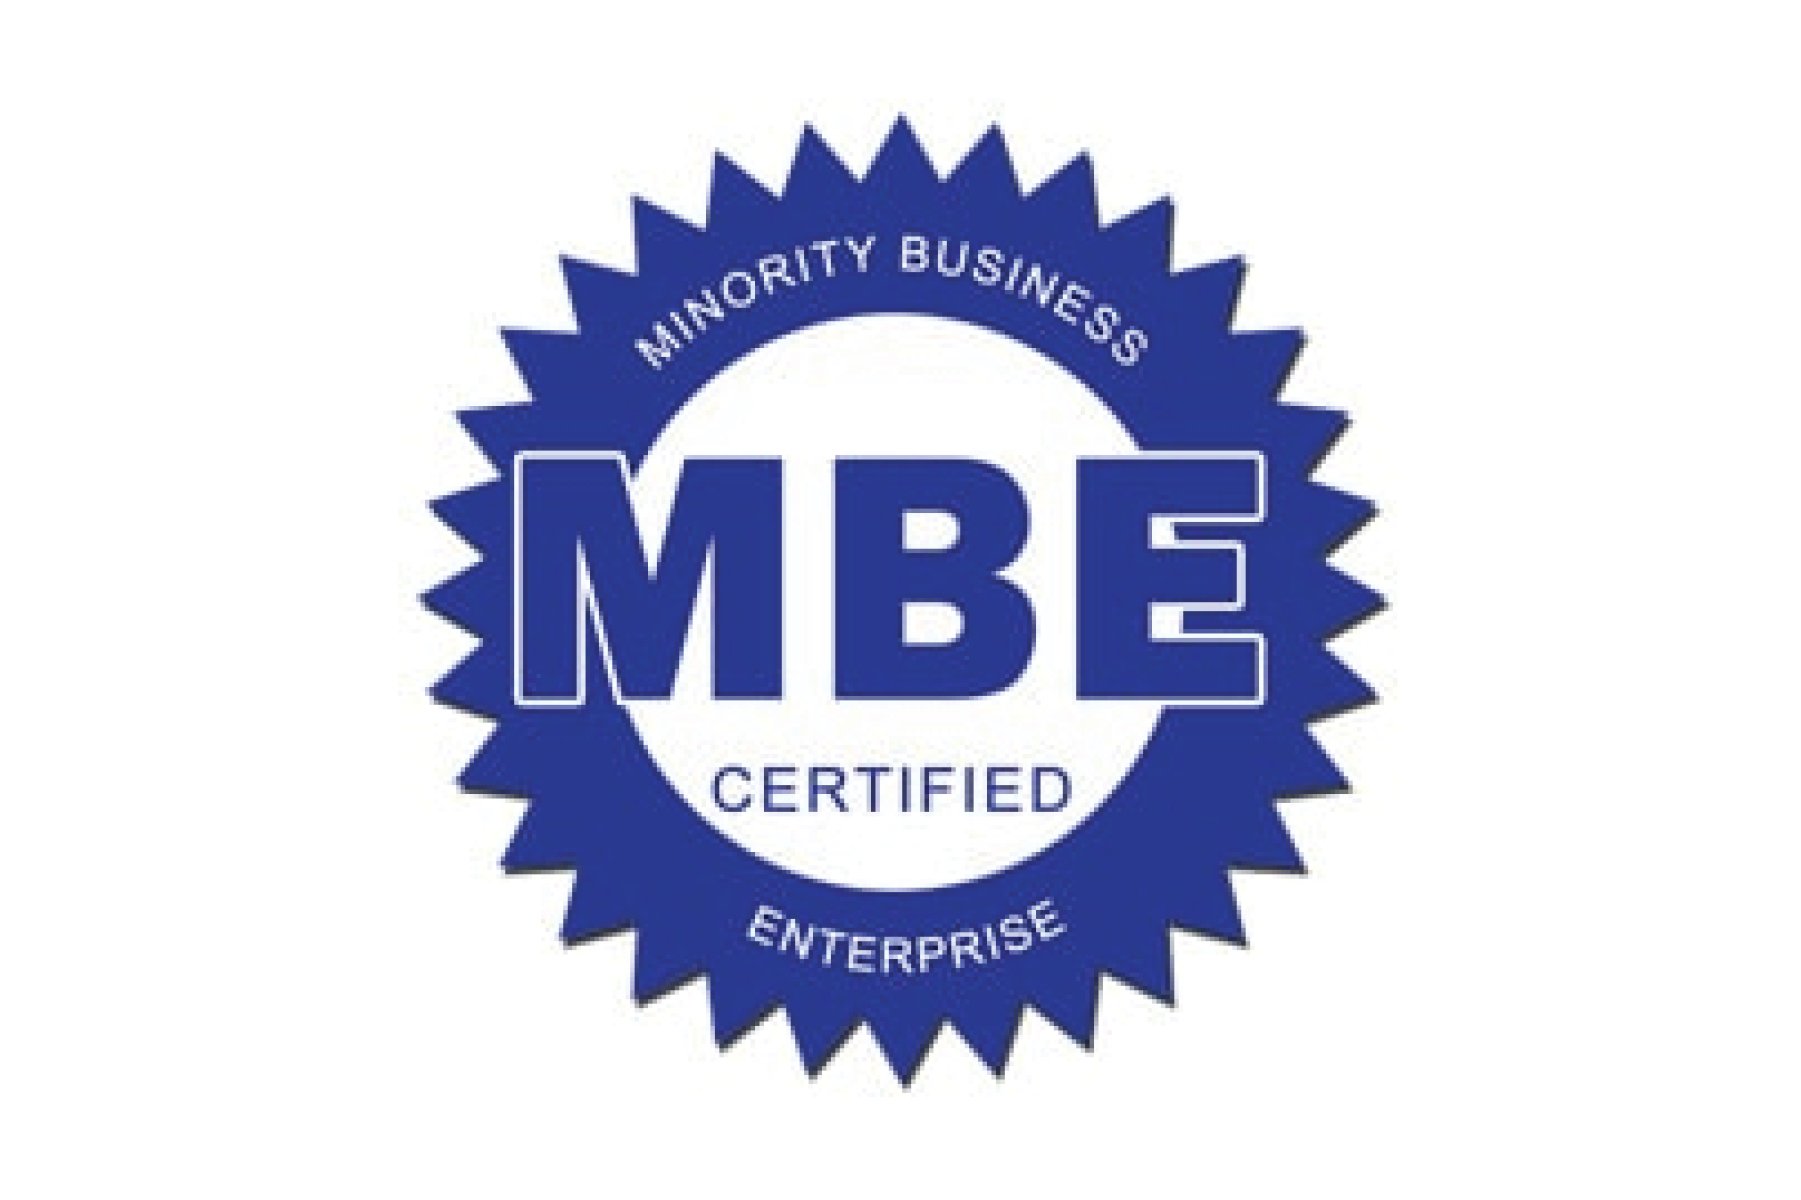 Minority Business Certified